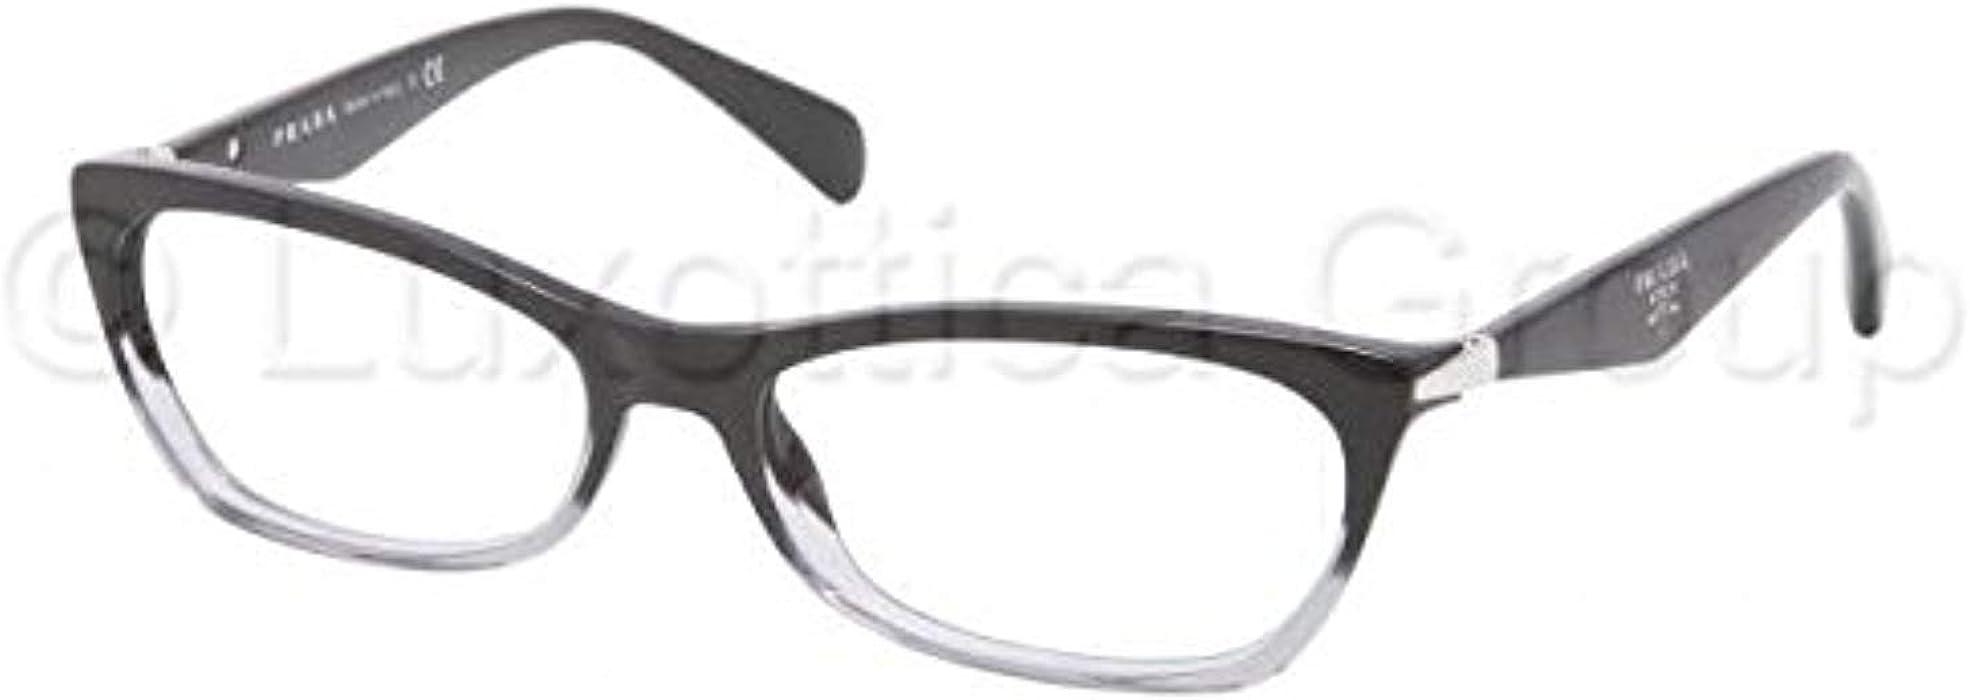 eb30825cb738 Prada Women s PR 15PV Eyeglasses 55mm at Amazon Men s Clothing store ...